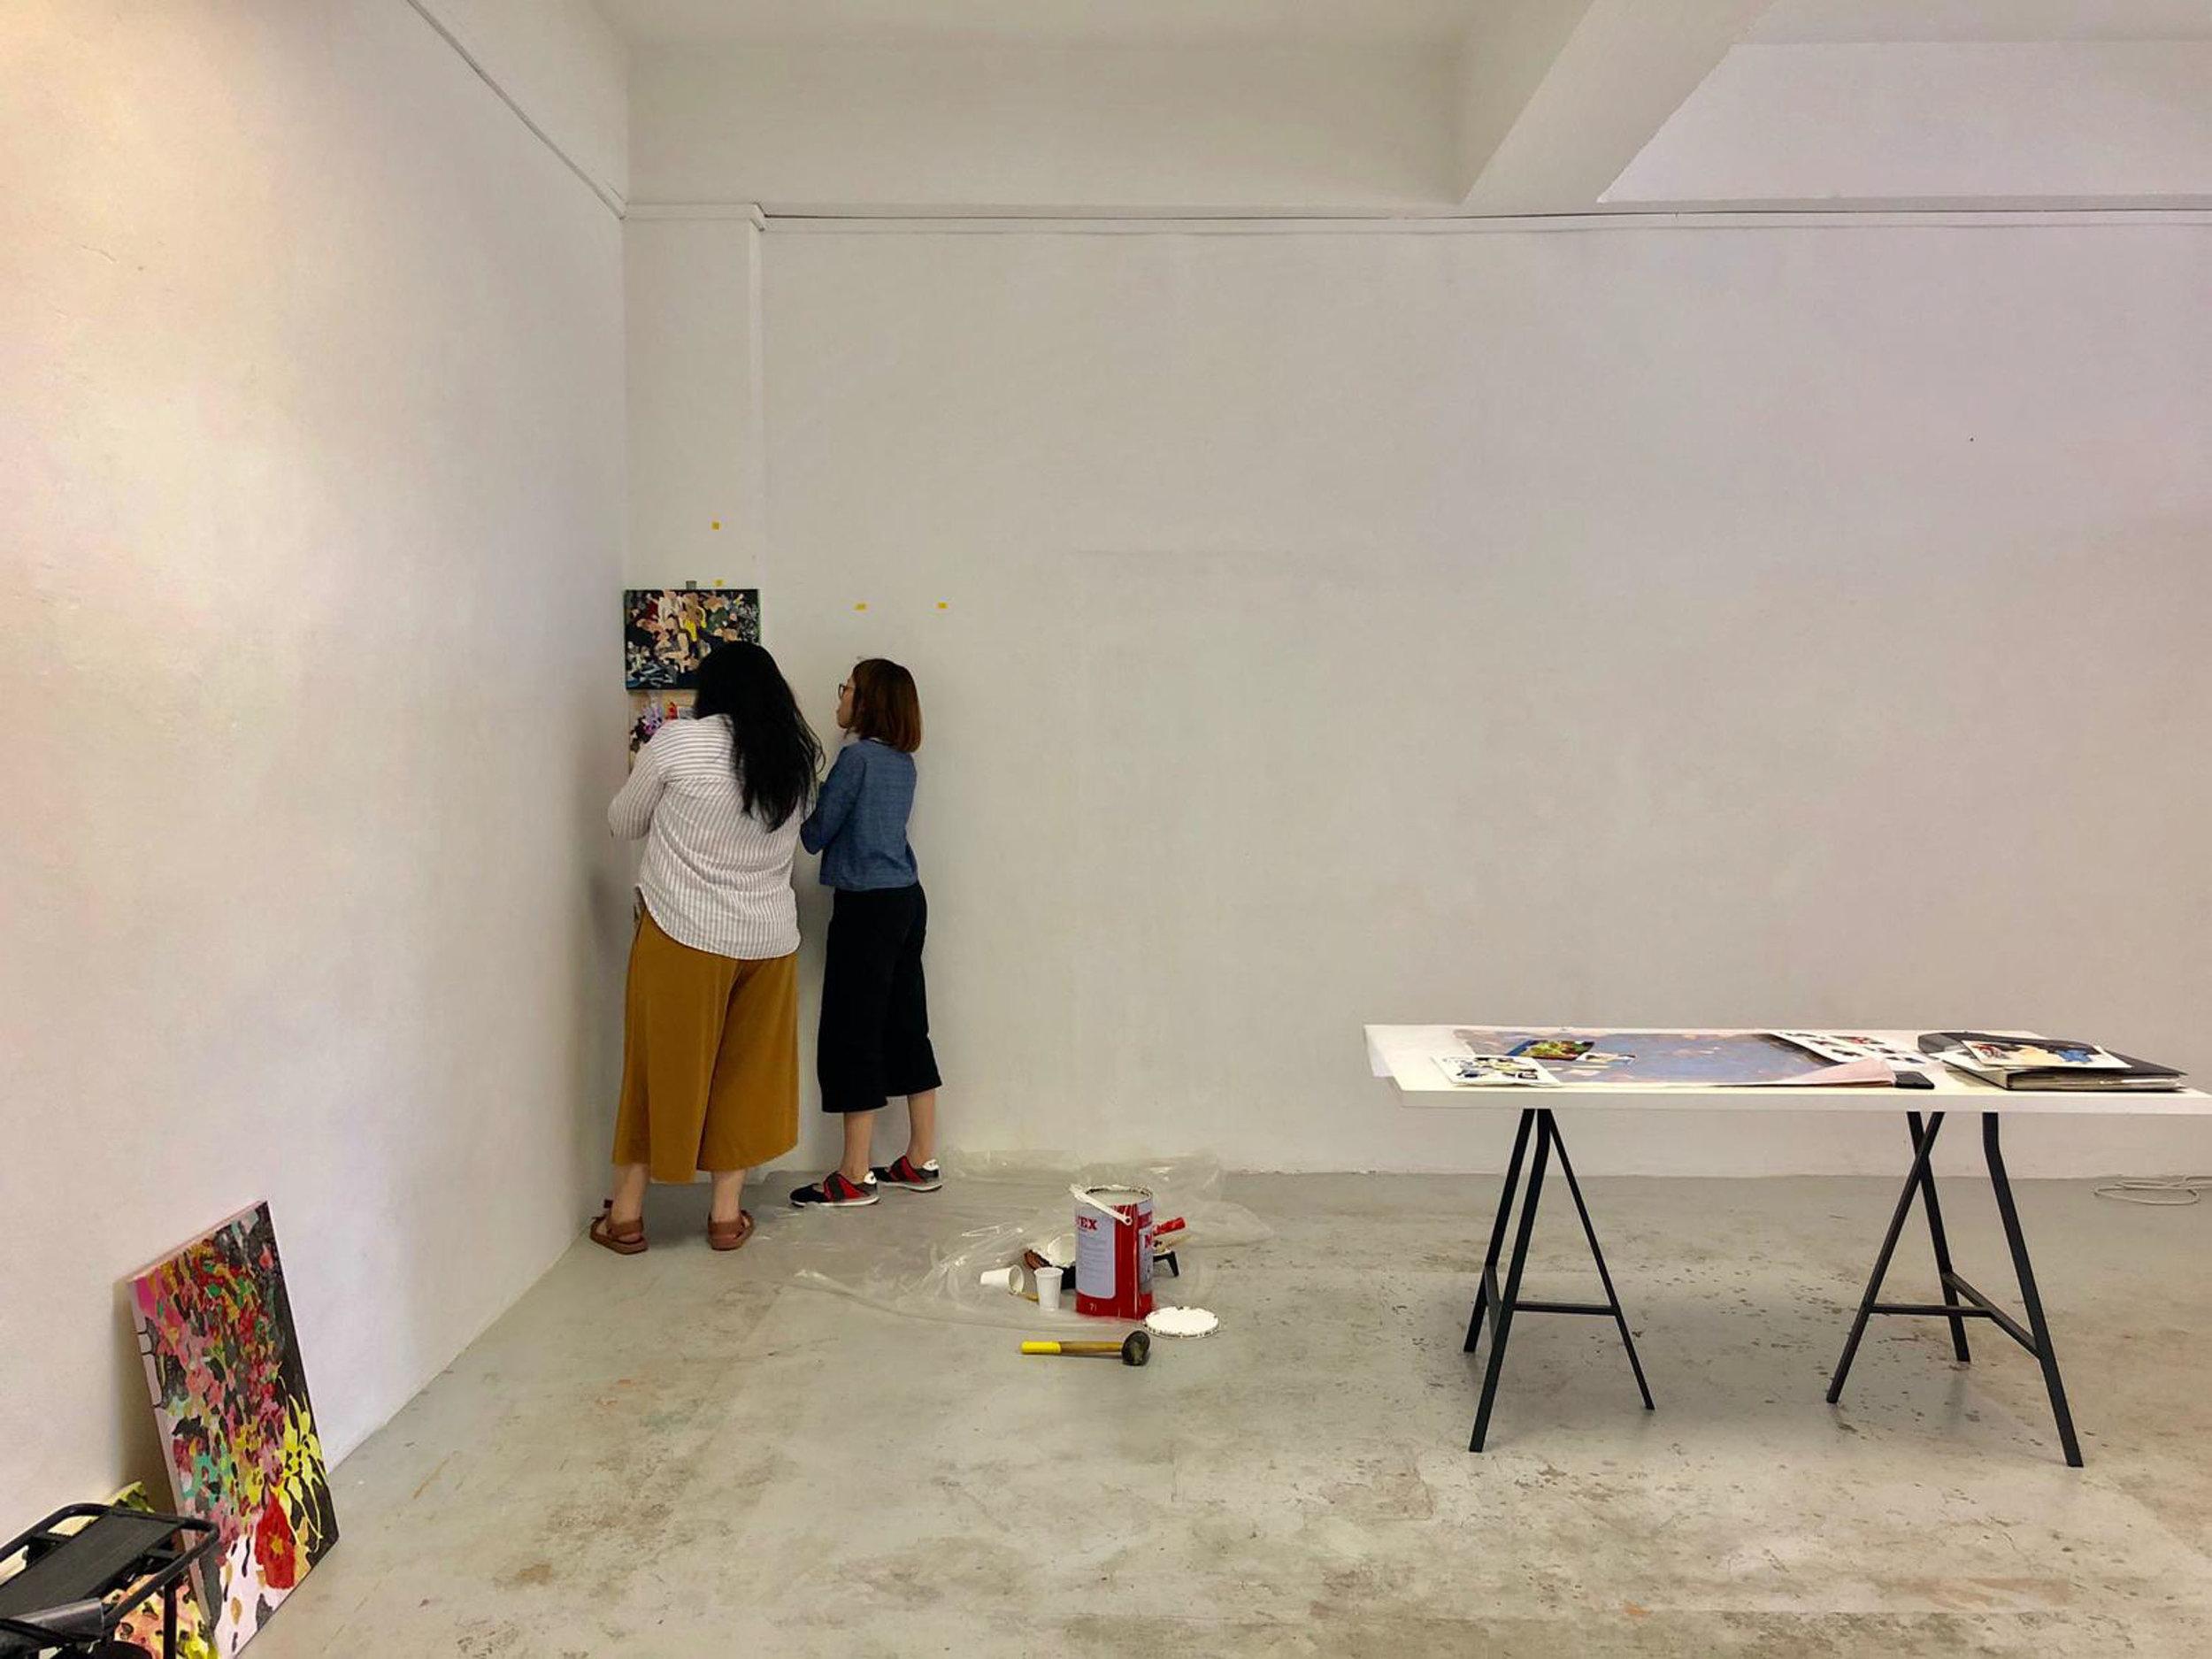 A behind-the-scenes look at Samantha and Jodi installing 'Section #7', at Peninsular. Image courtesy of Peninsular.